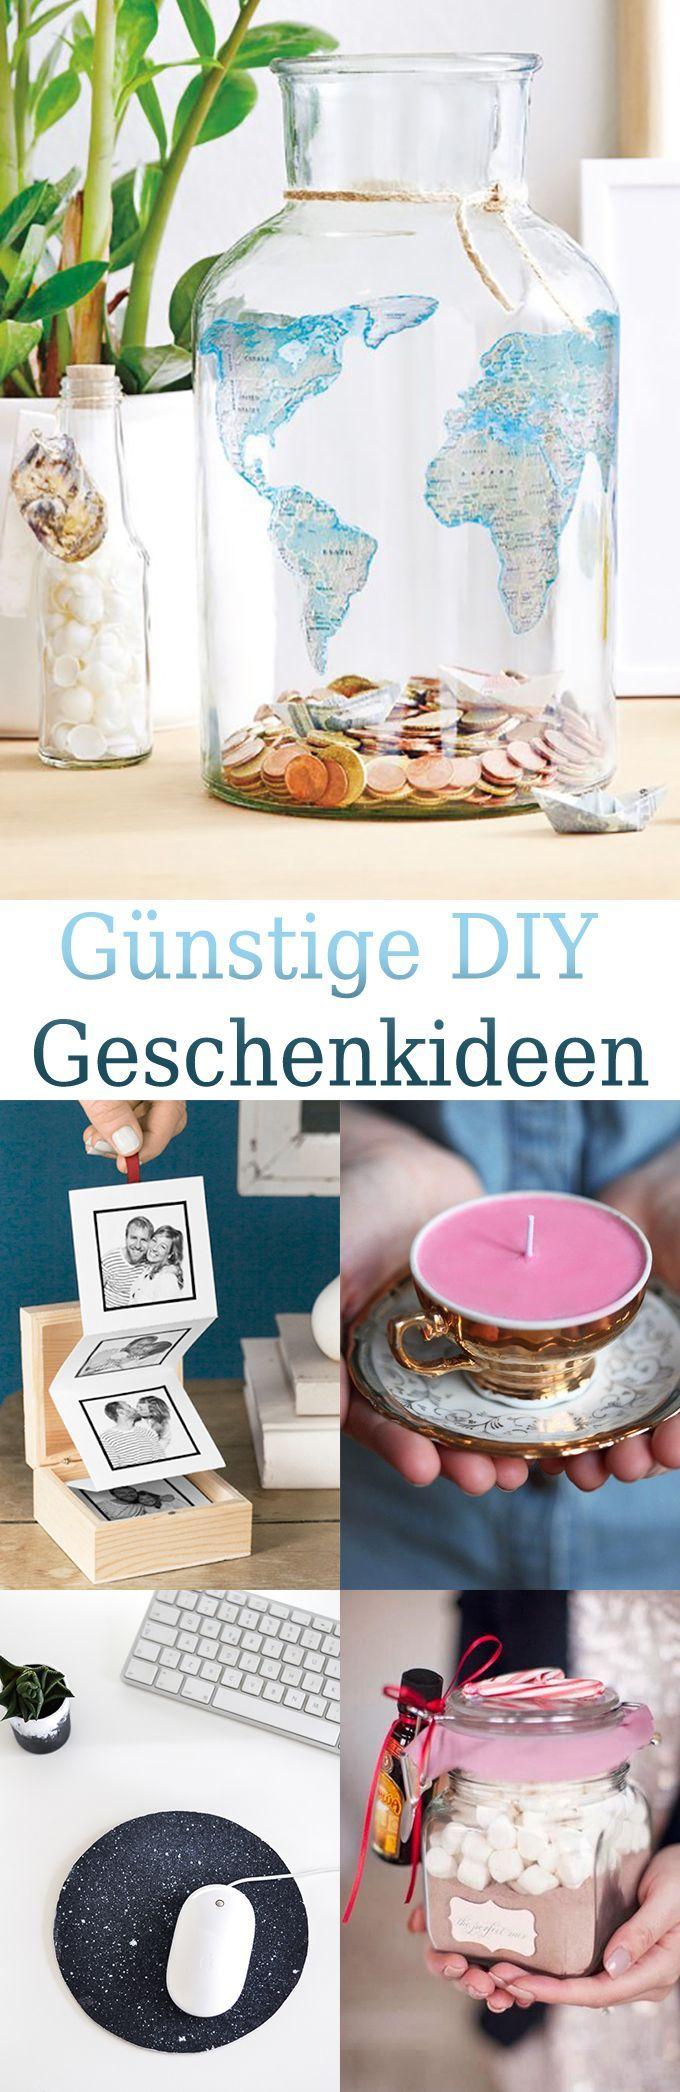 Günstige Geschenkideen zum selber machen - DIY Bastelideen | DIY ...